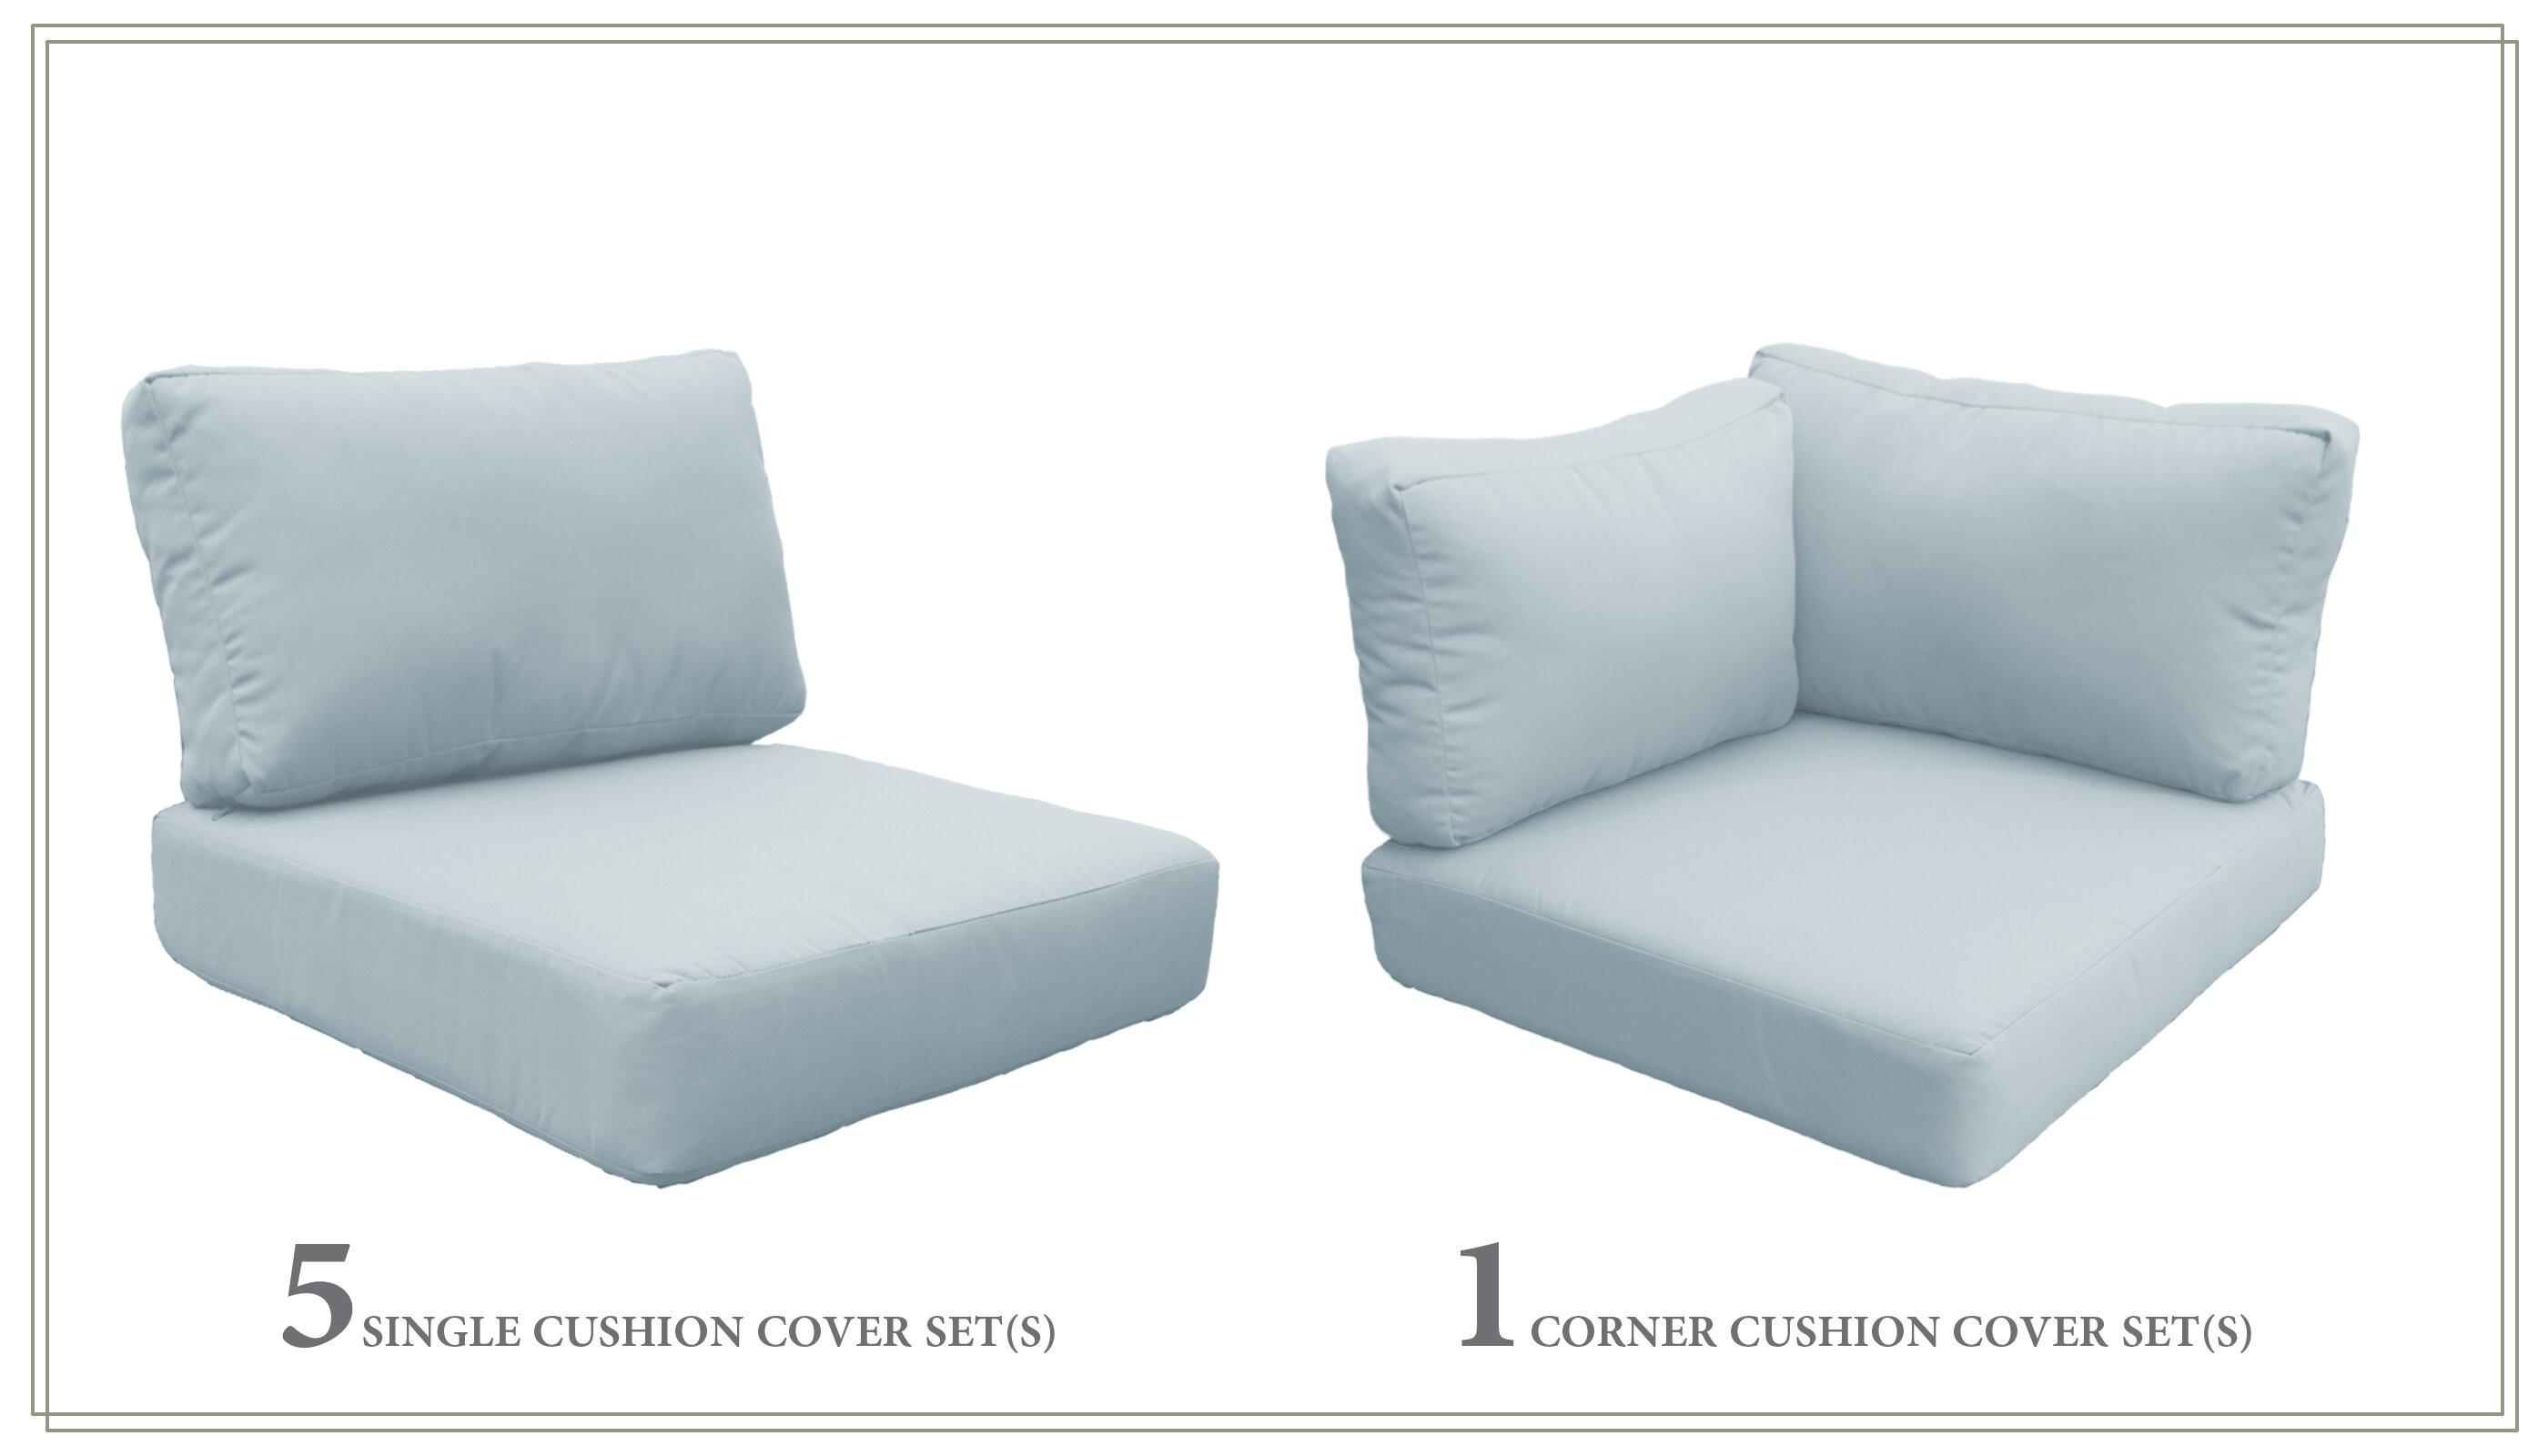 Outdoor Patio Couch Set, Sol 72 Outdoor High Back Indoor Outdoor Sofa Cushion Wayfair